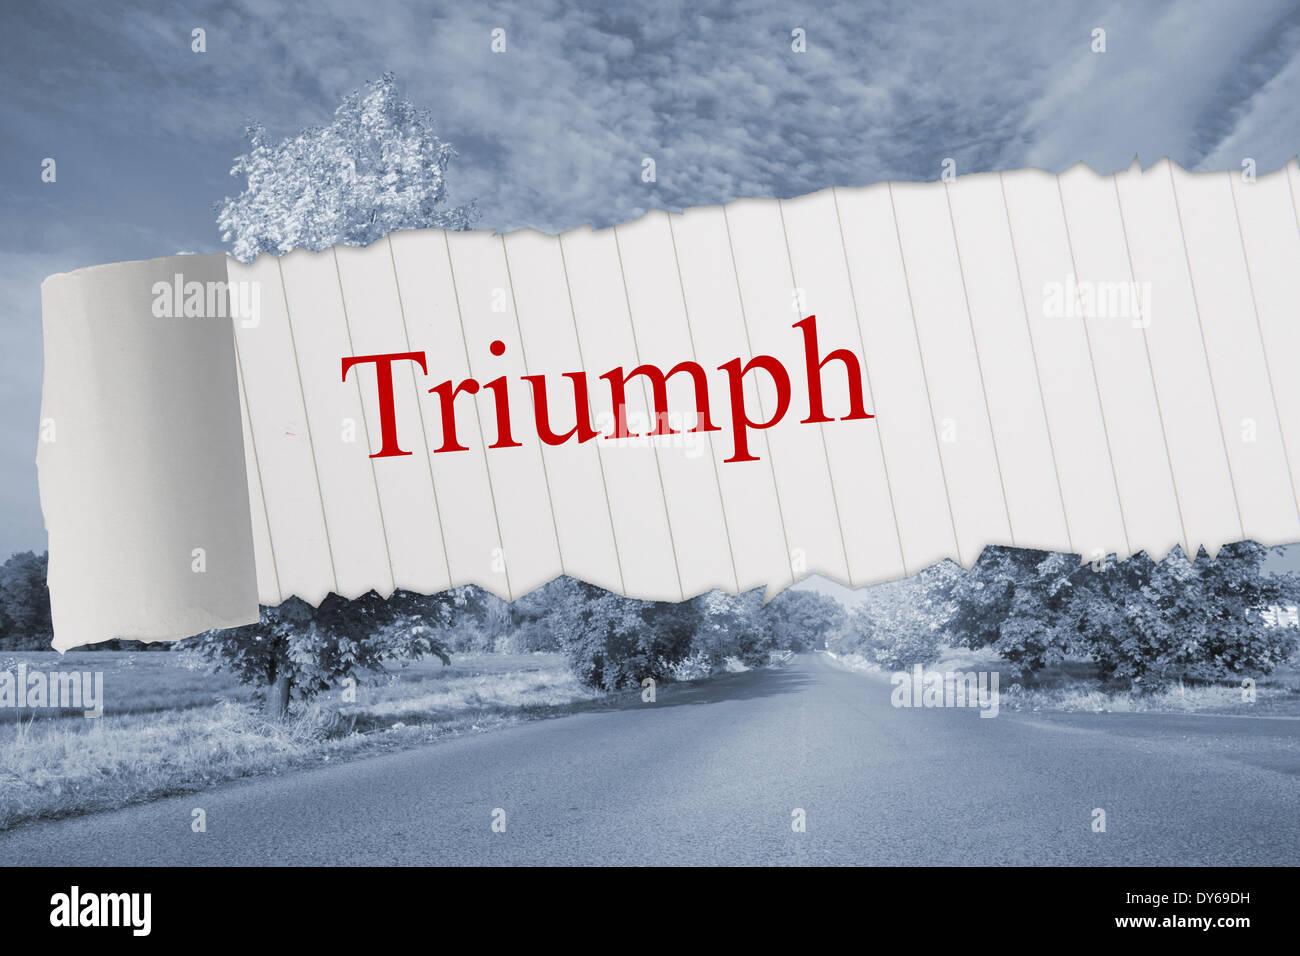 Triumph against warped road - Stock Image